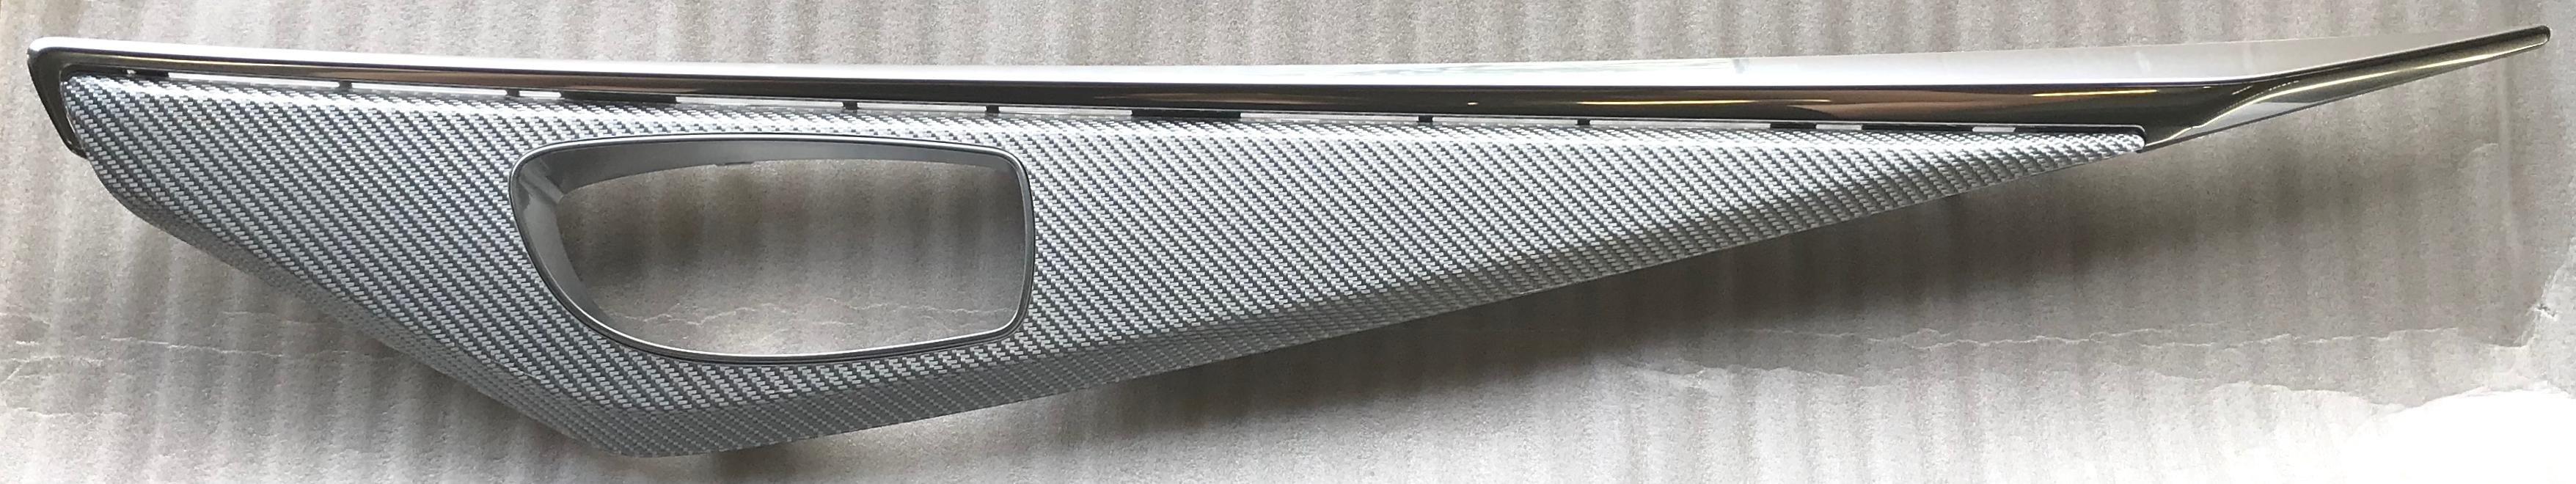 Finish Molding - Infiniti (80880-5CM0A)